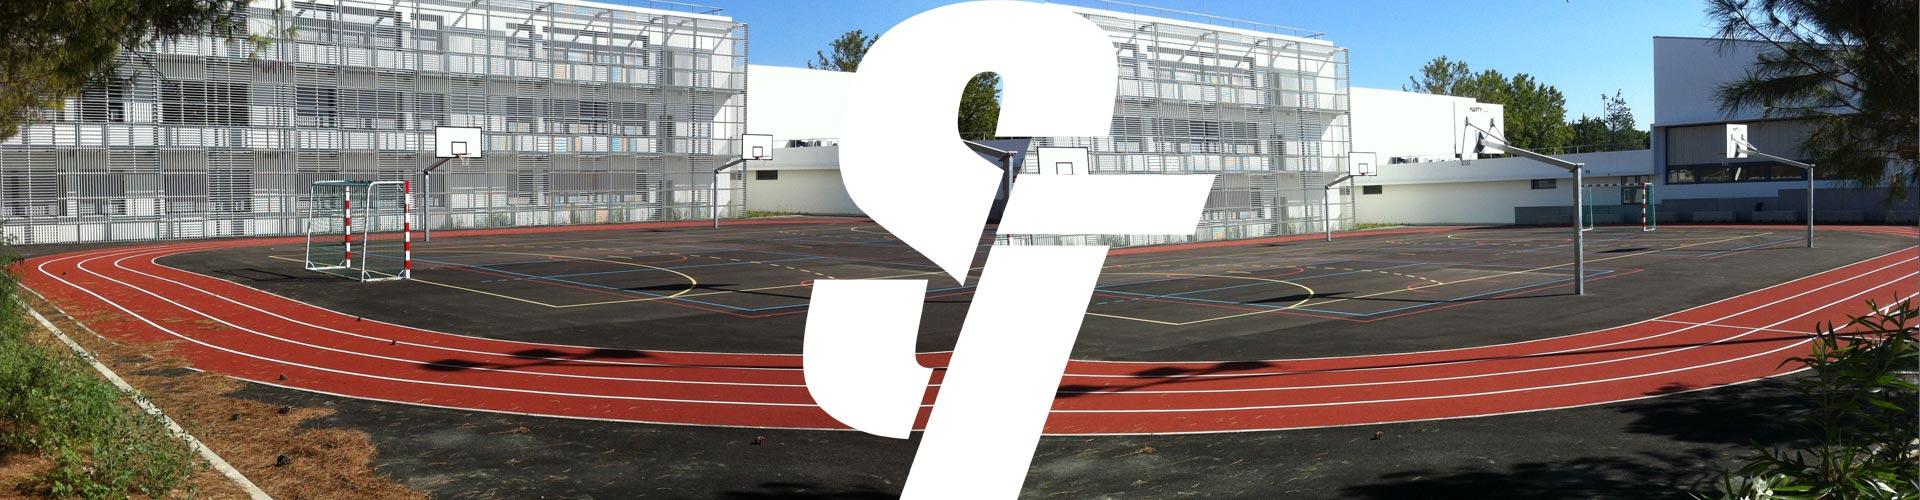 Piste athlétisme 1 – ISTRES (13)